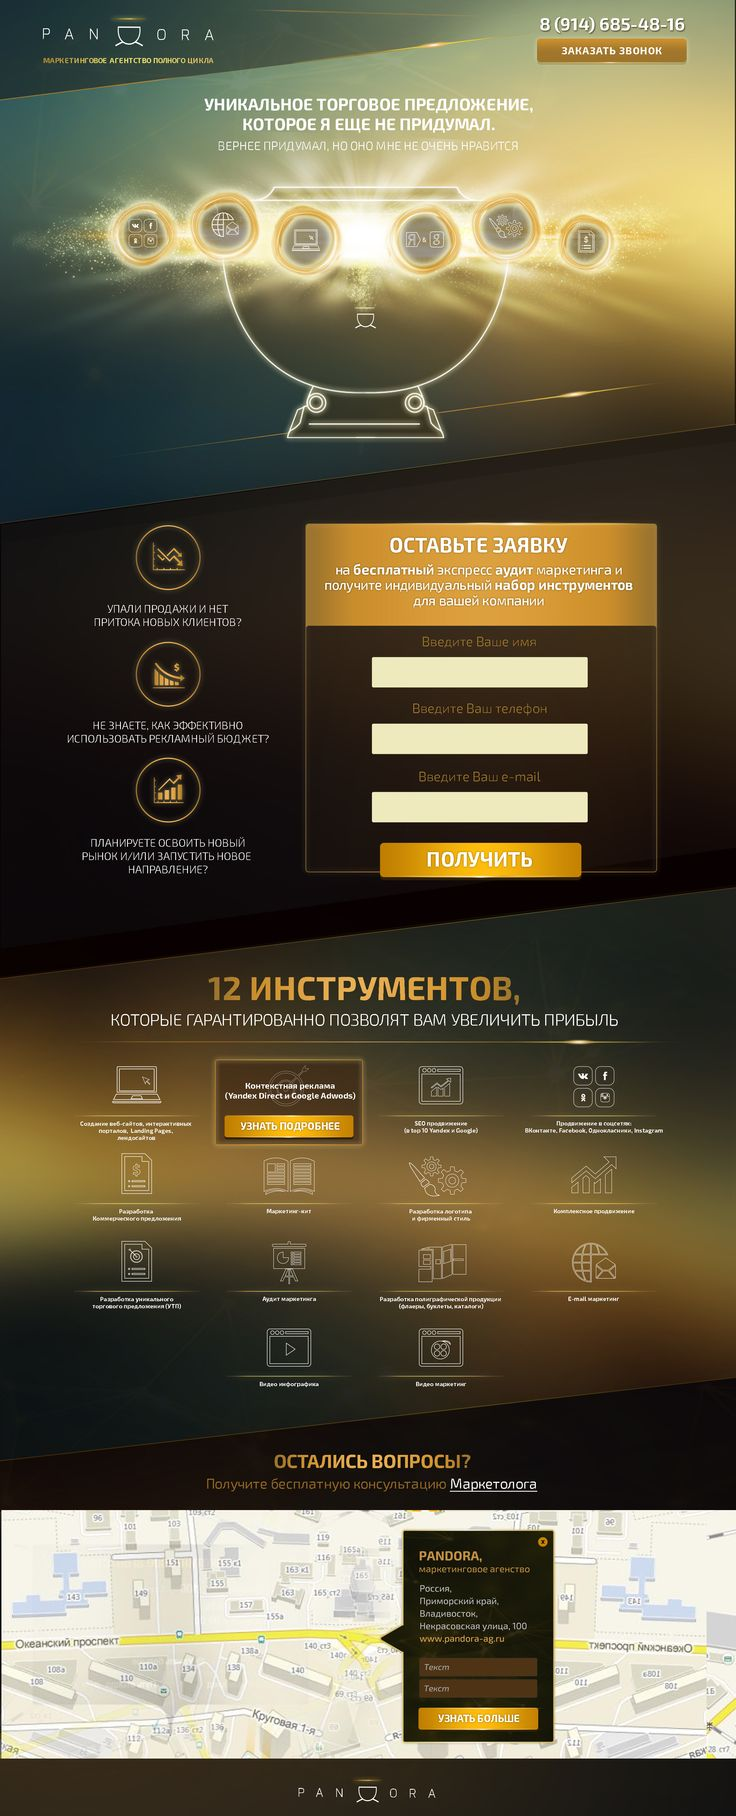 """PANDORA""  Advertising Agency #landing, #page, #design, #web, #HTML5, #photoshop, #website"